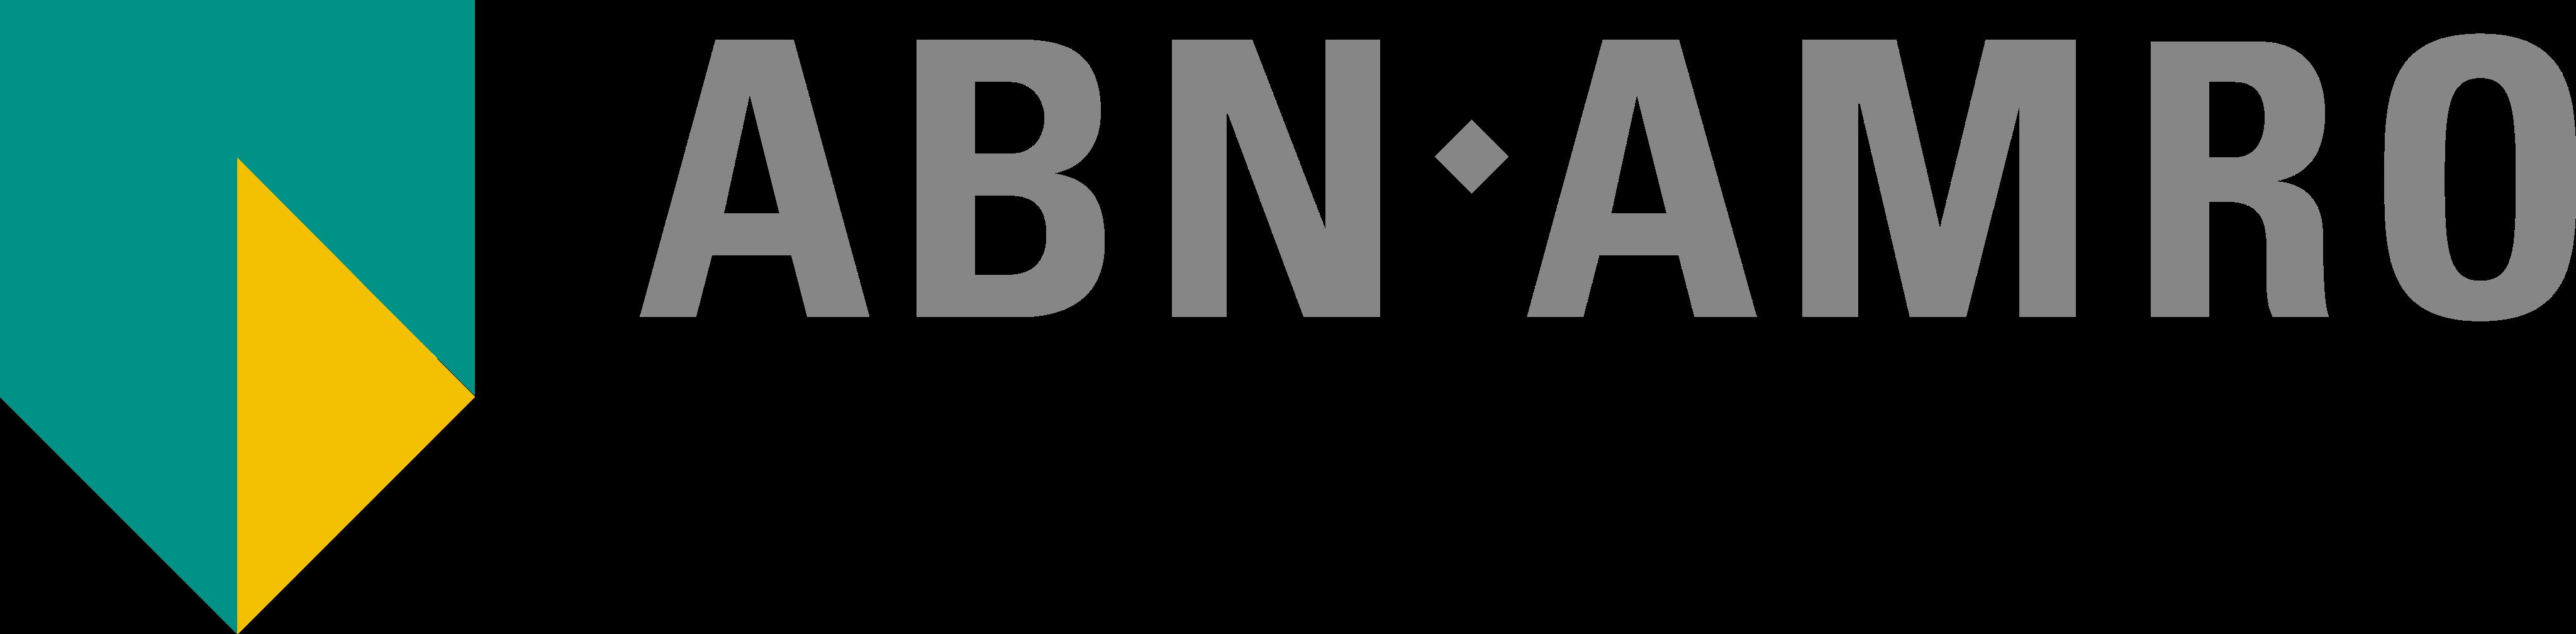 abn amro logo - ABN AMRO Logo